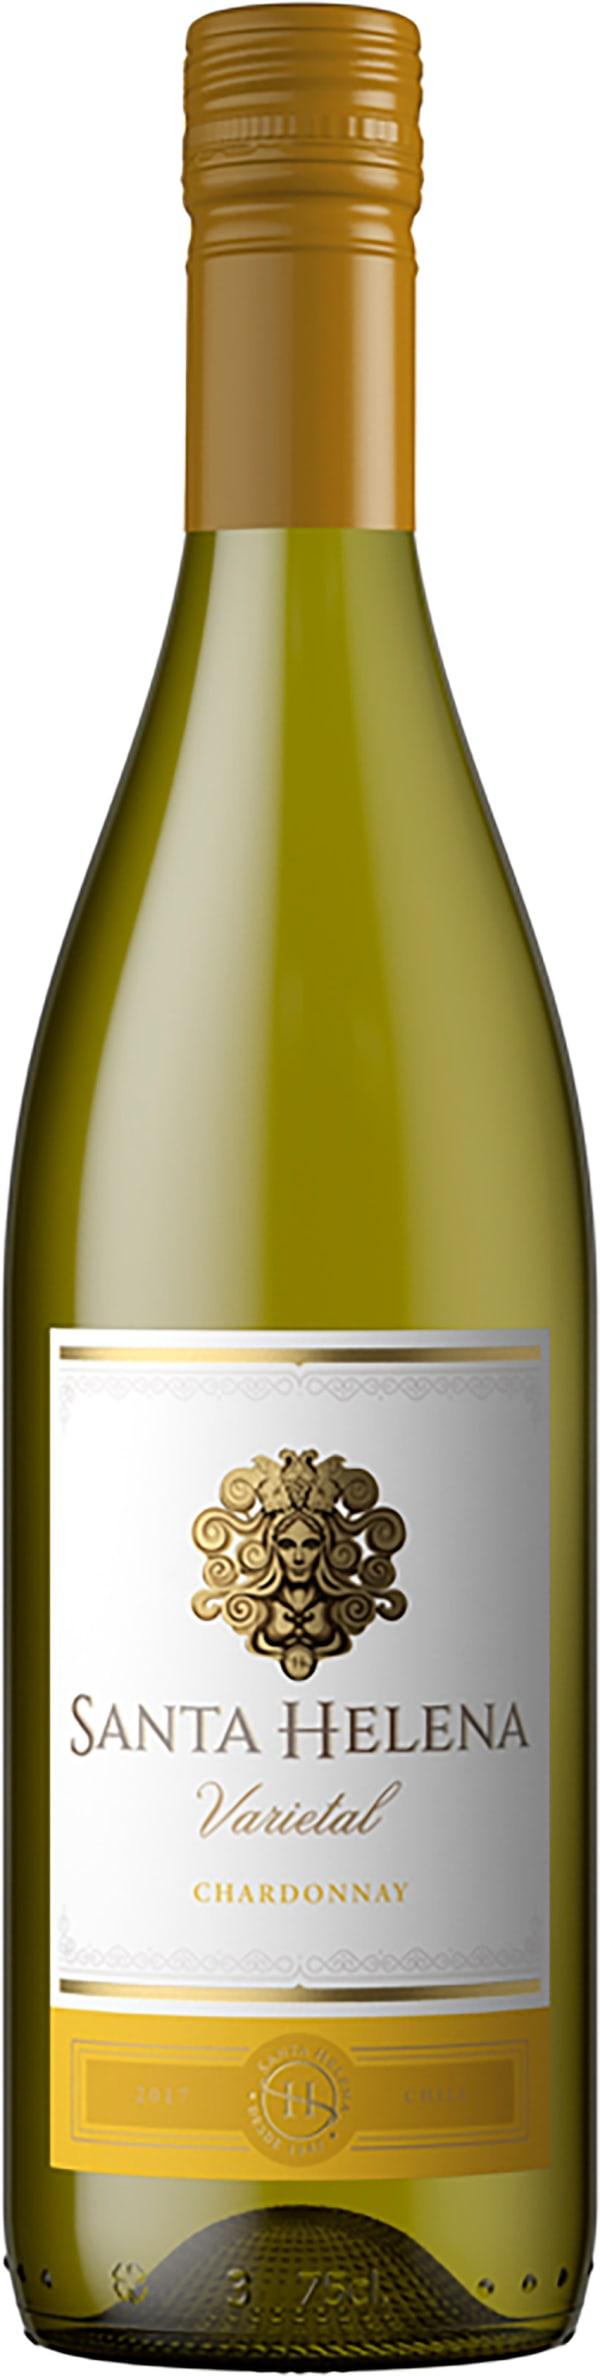 Santa Helena Varietal Chardonnay 2020